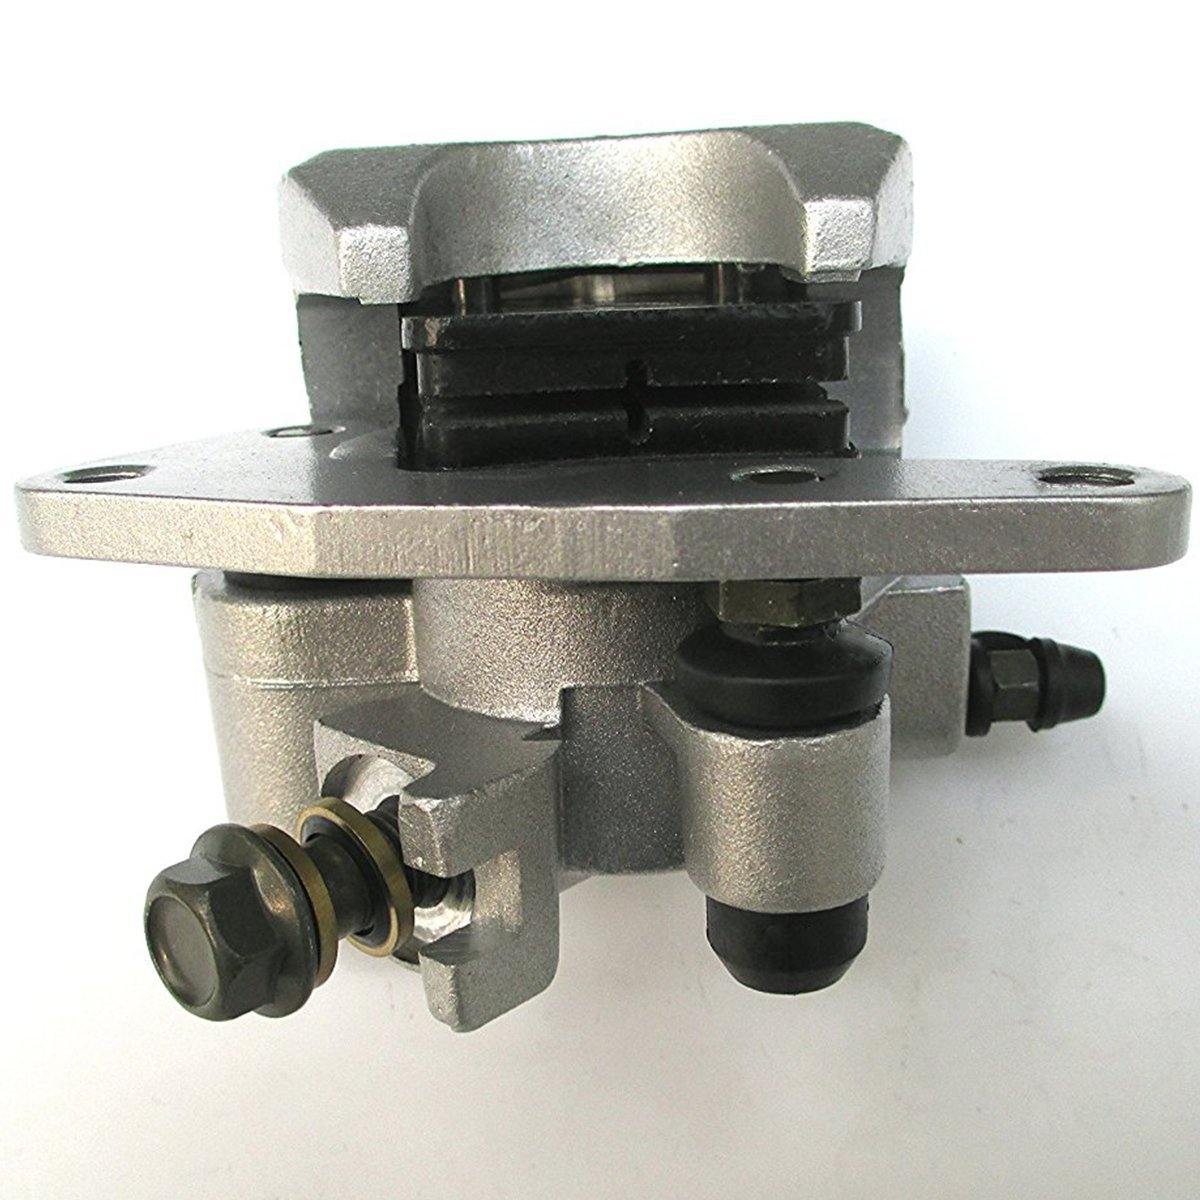 Aquiver Auto Parts New Front Brake Caliper Set for Suzuki Vinson 500 LTA 500F LT-A500F 2002-2007